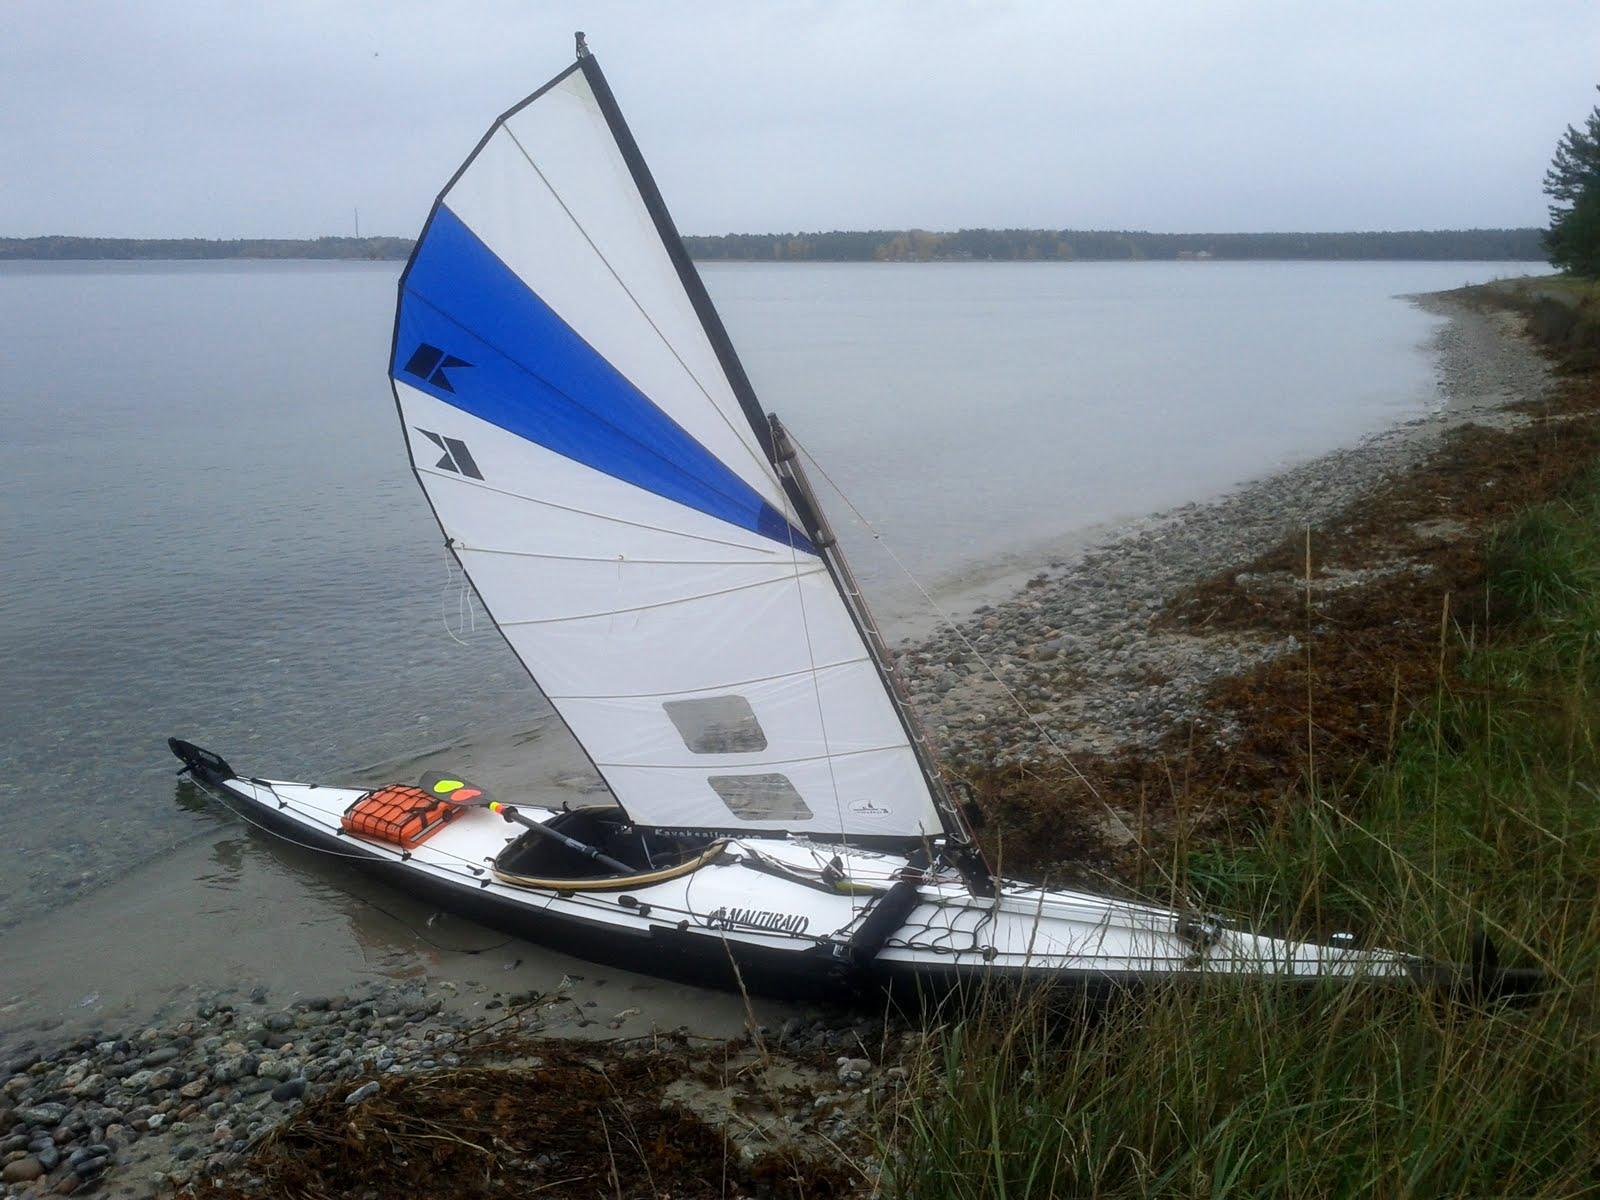 kayaksailor sail klepper